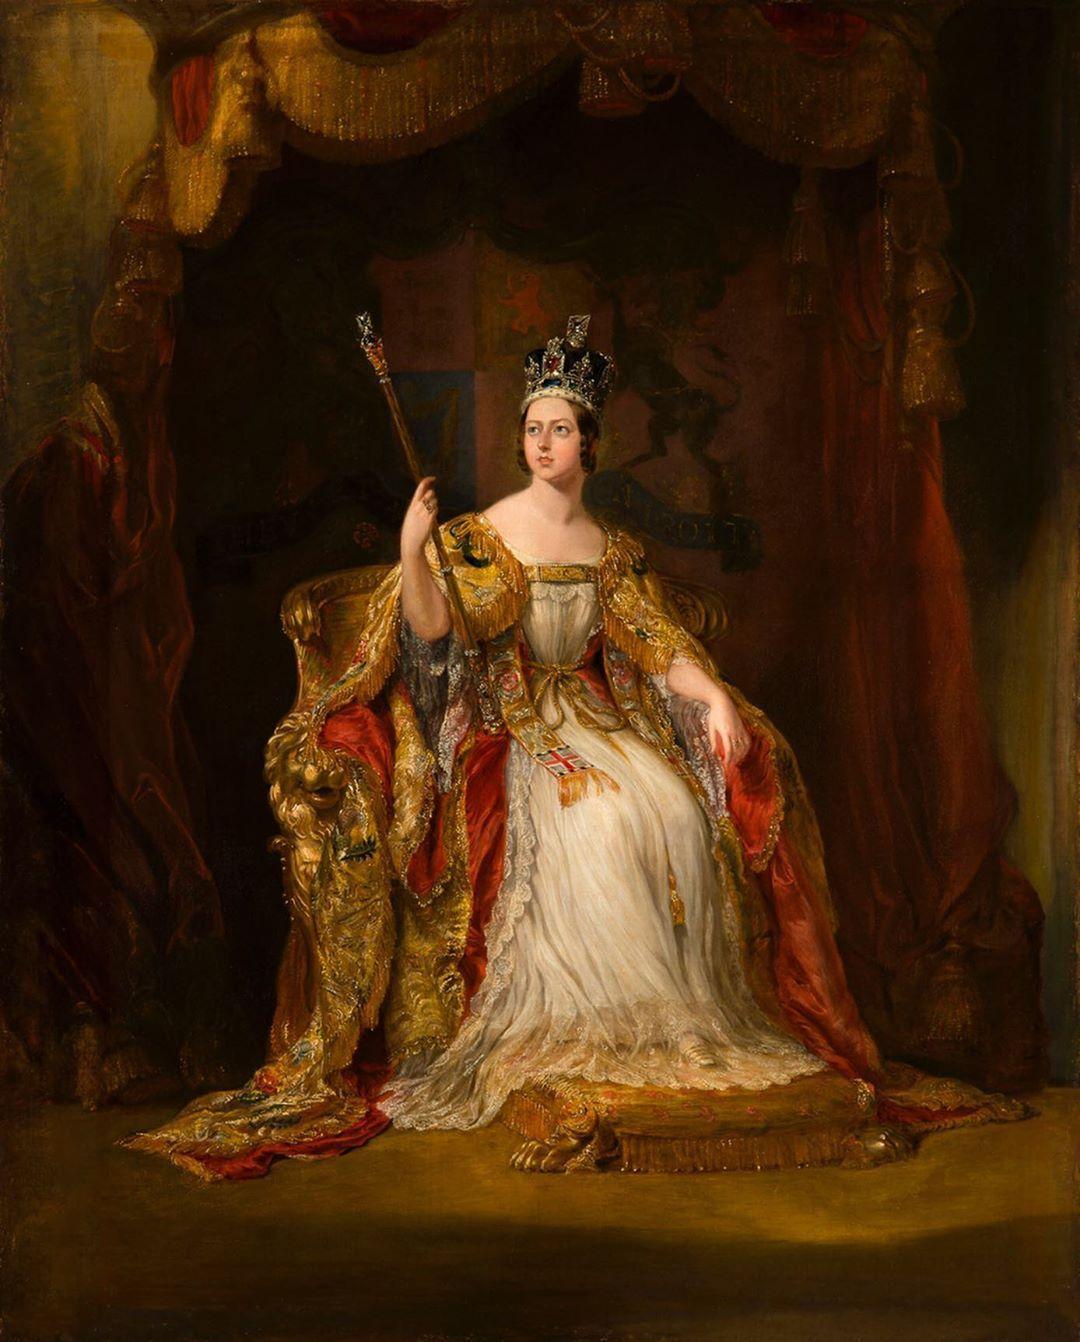 "𝐌𝐨𝐧𝐚𝐫𝐜𝐡𝐢𝐞𝐬 𝐨𝐟 𝐄𝐮𝐫𝐨𝐩𝐞 on Instagram: """"Queen Victoria"" a  Coronation portrait by Sir Geo… | Queen victoria, Young queen victoria, Victorian  portraits"